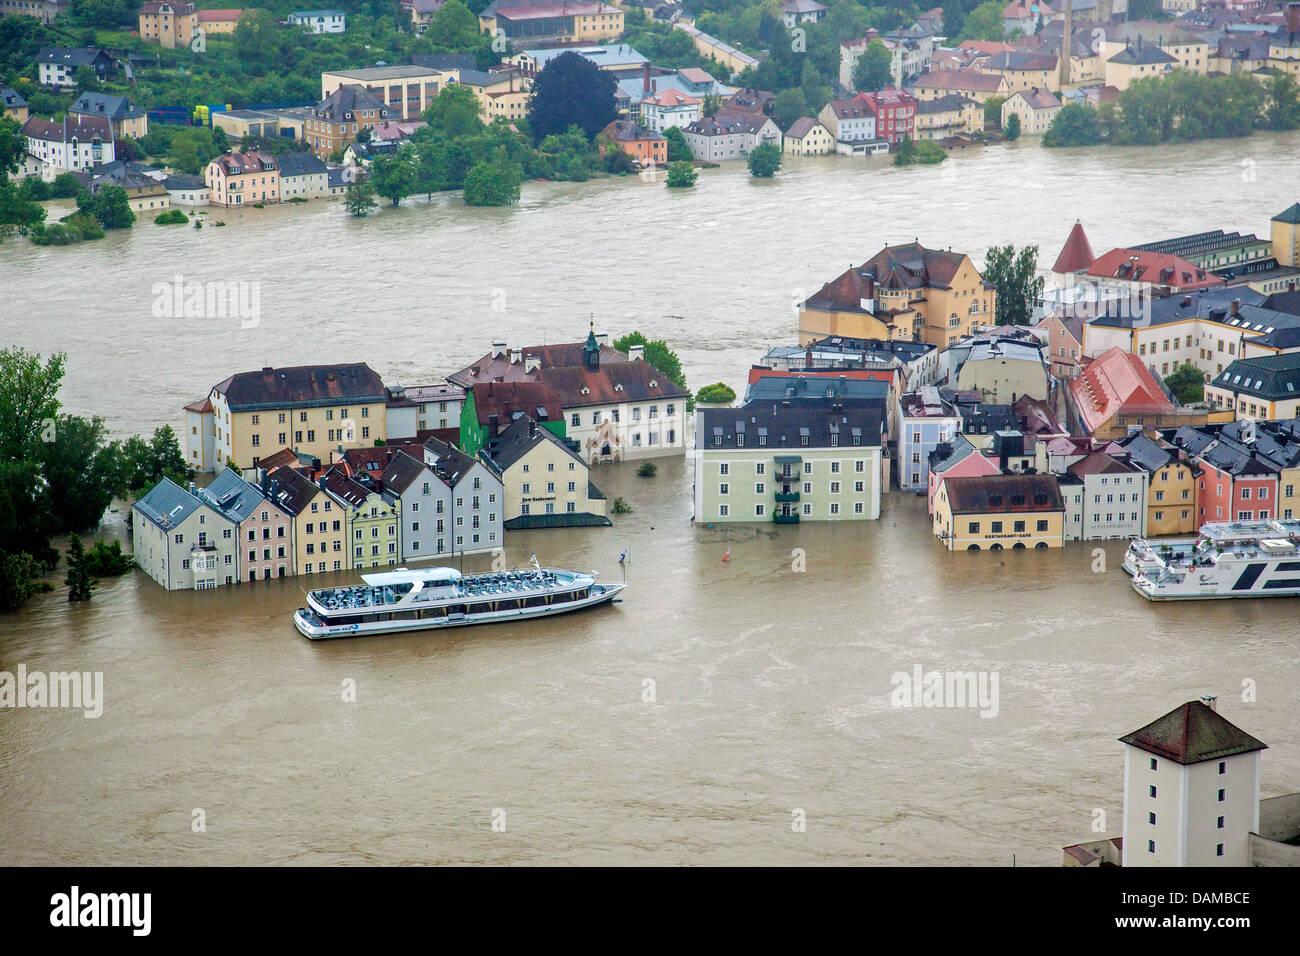 Donaukai with cruise ships in Passau flooded in June 2013, Germany, Bavaria, Passau - Stock Image